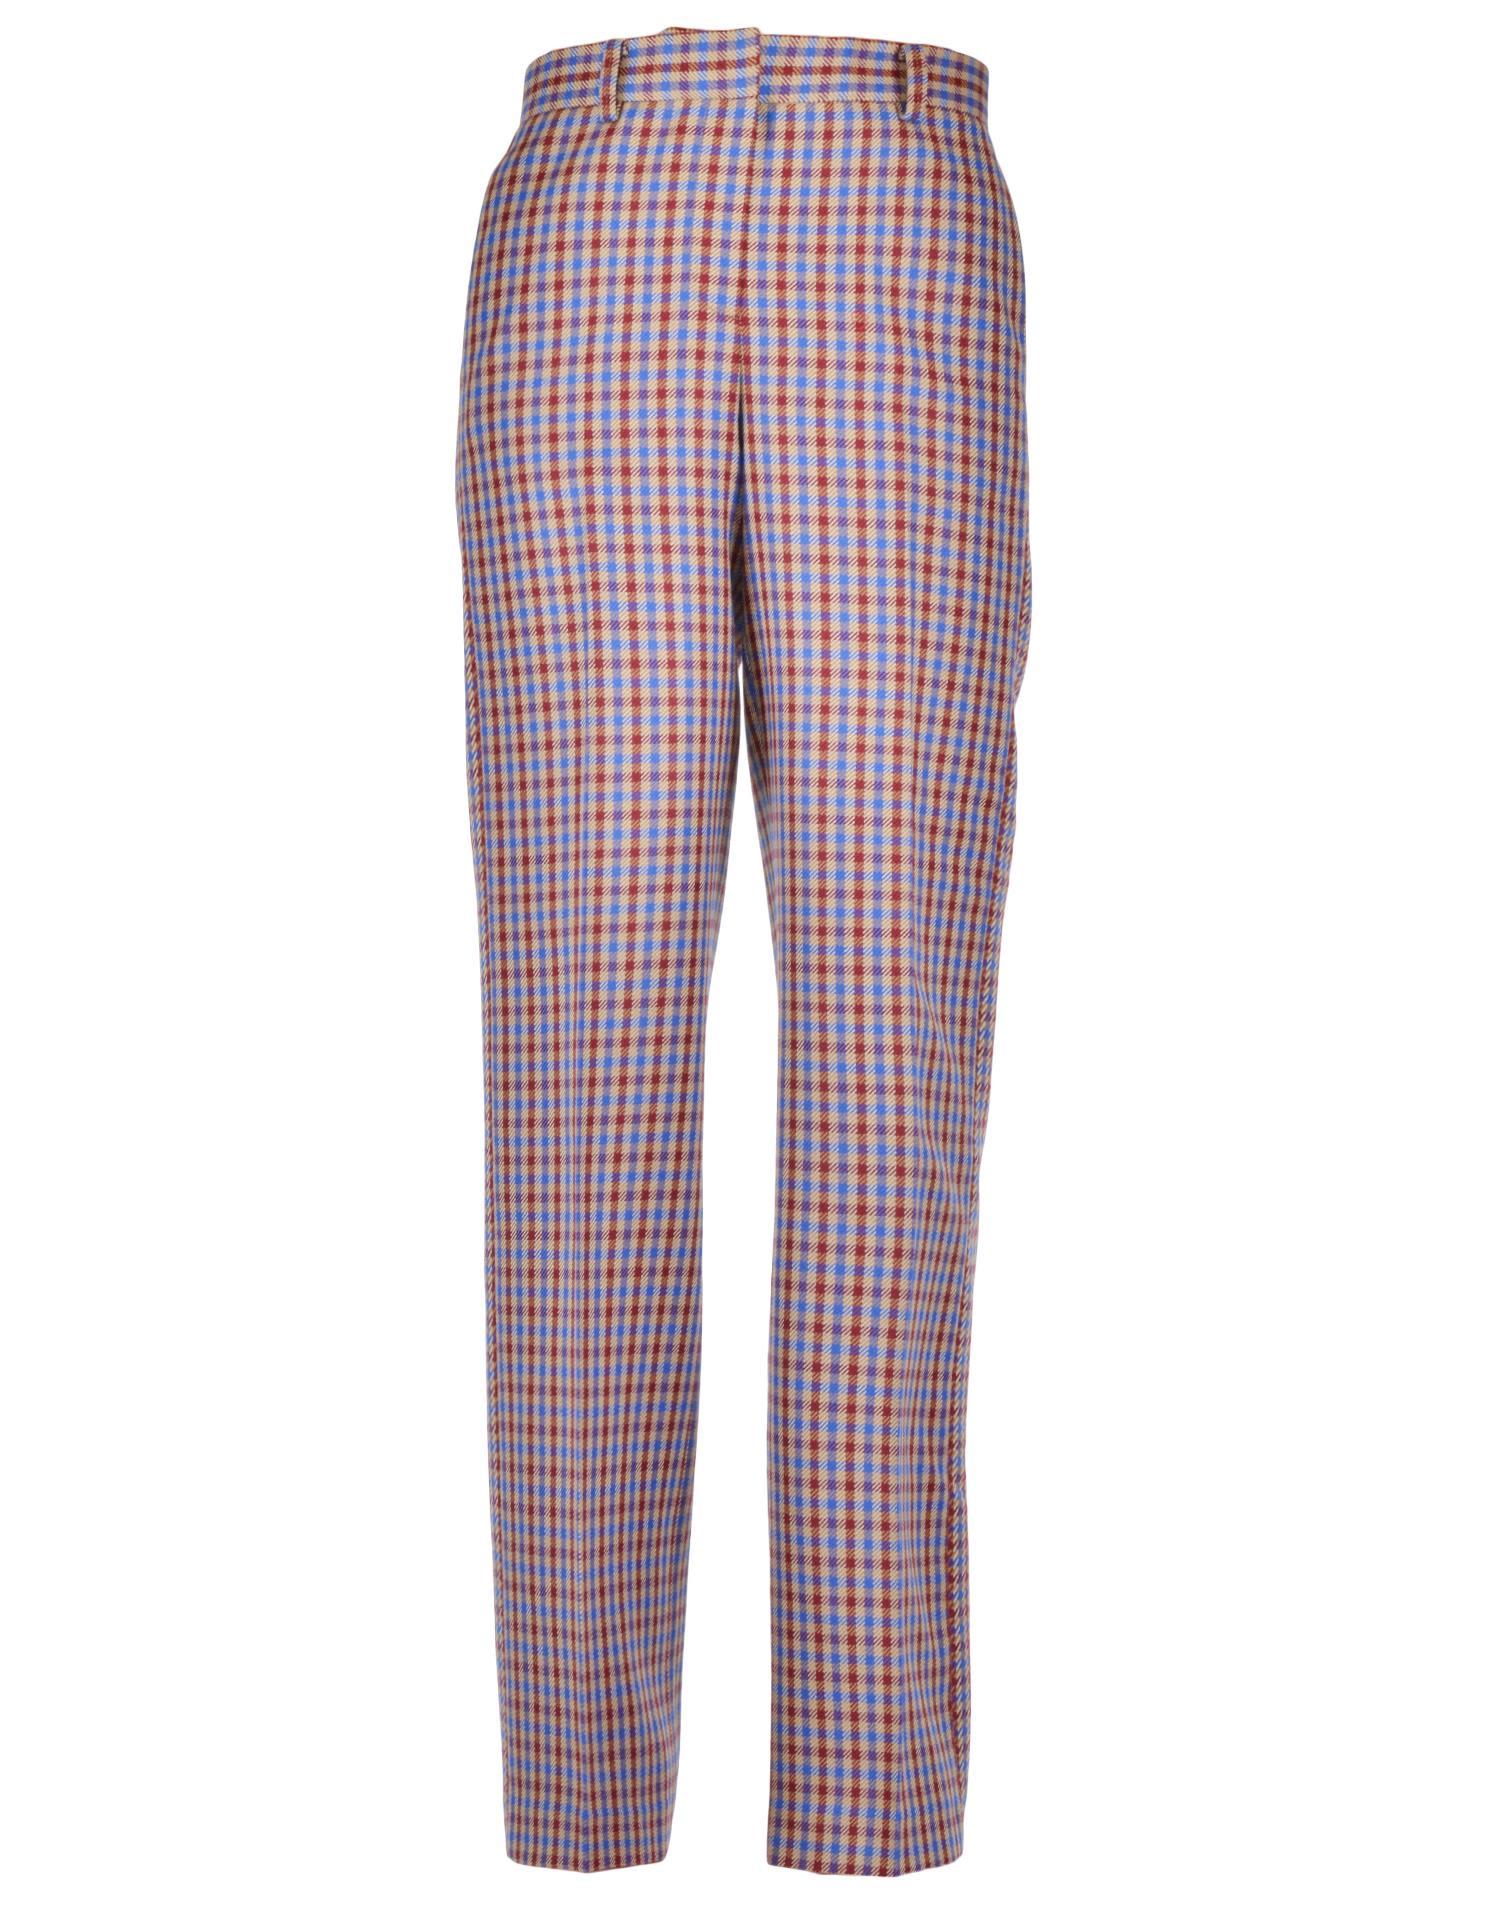 Tory Burch Wool Blend Trousers